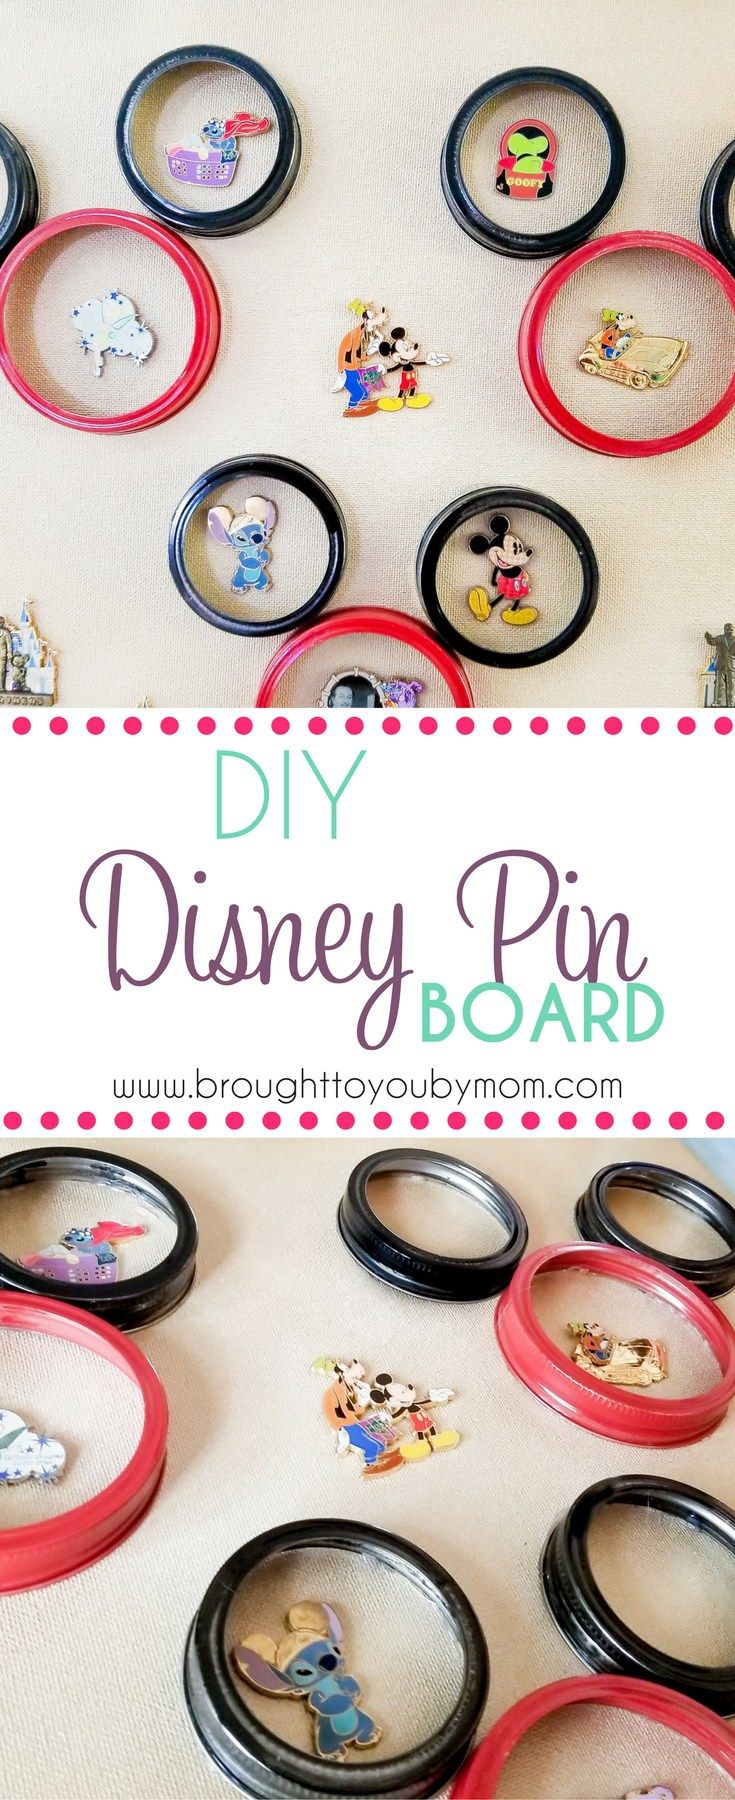 DIY Disney Pin Board - Disney Pin Display Idea | Disney pins, Pin ...